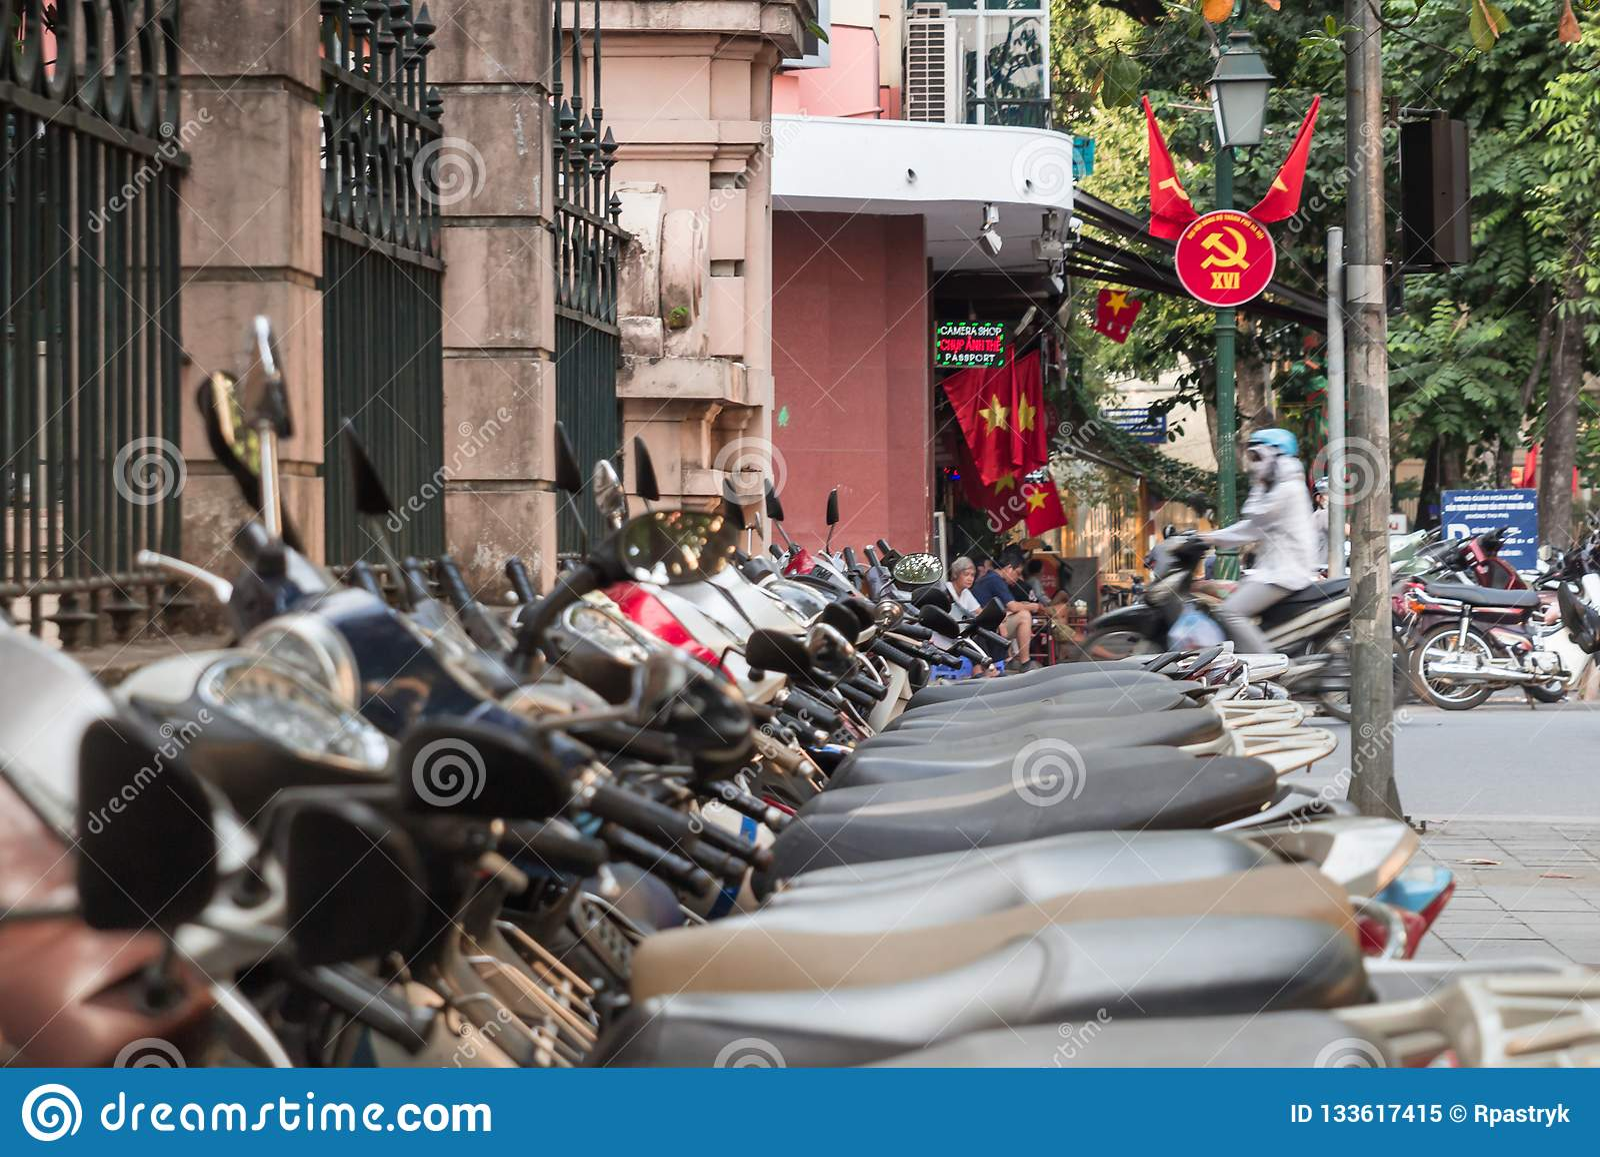 Scooters and communist propaganda symbol in Hanoi, Vietnam